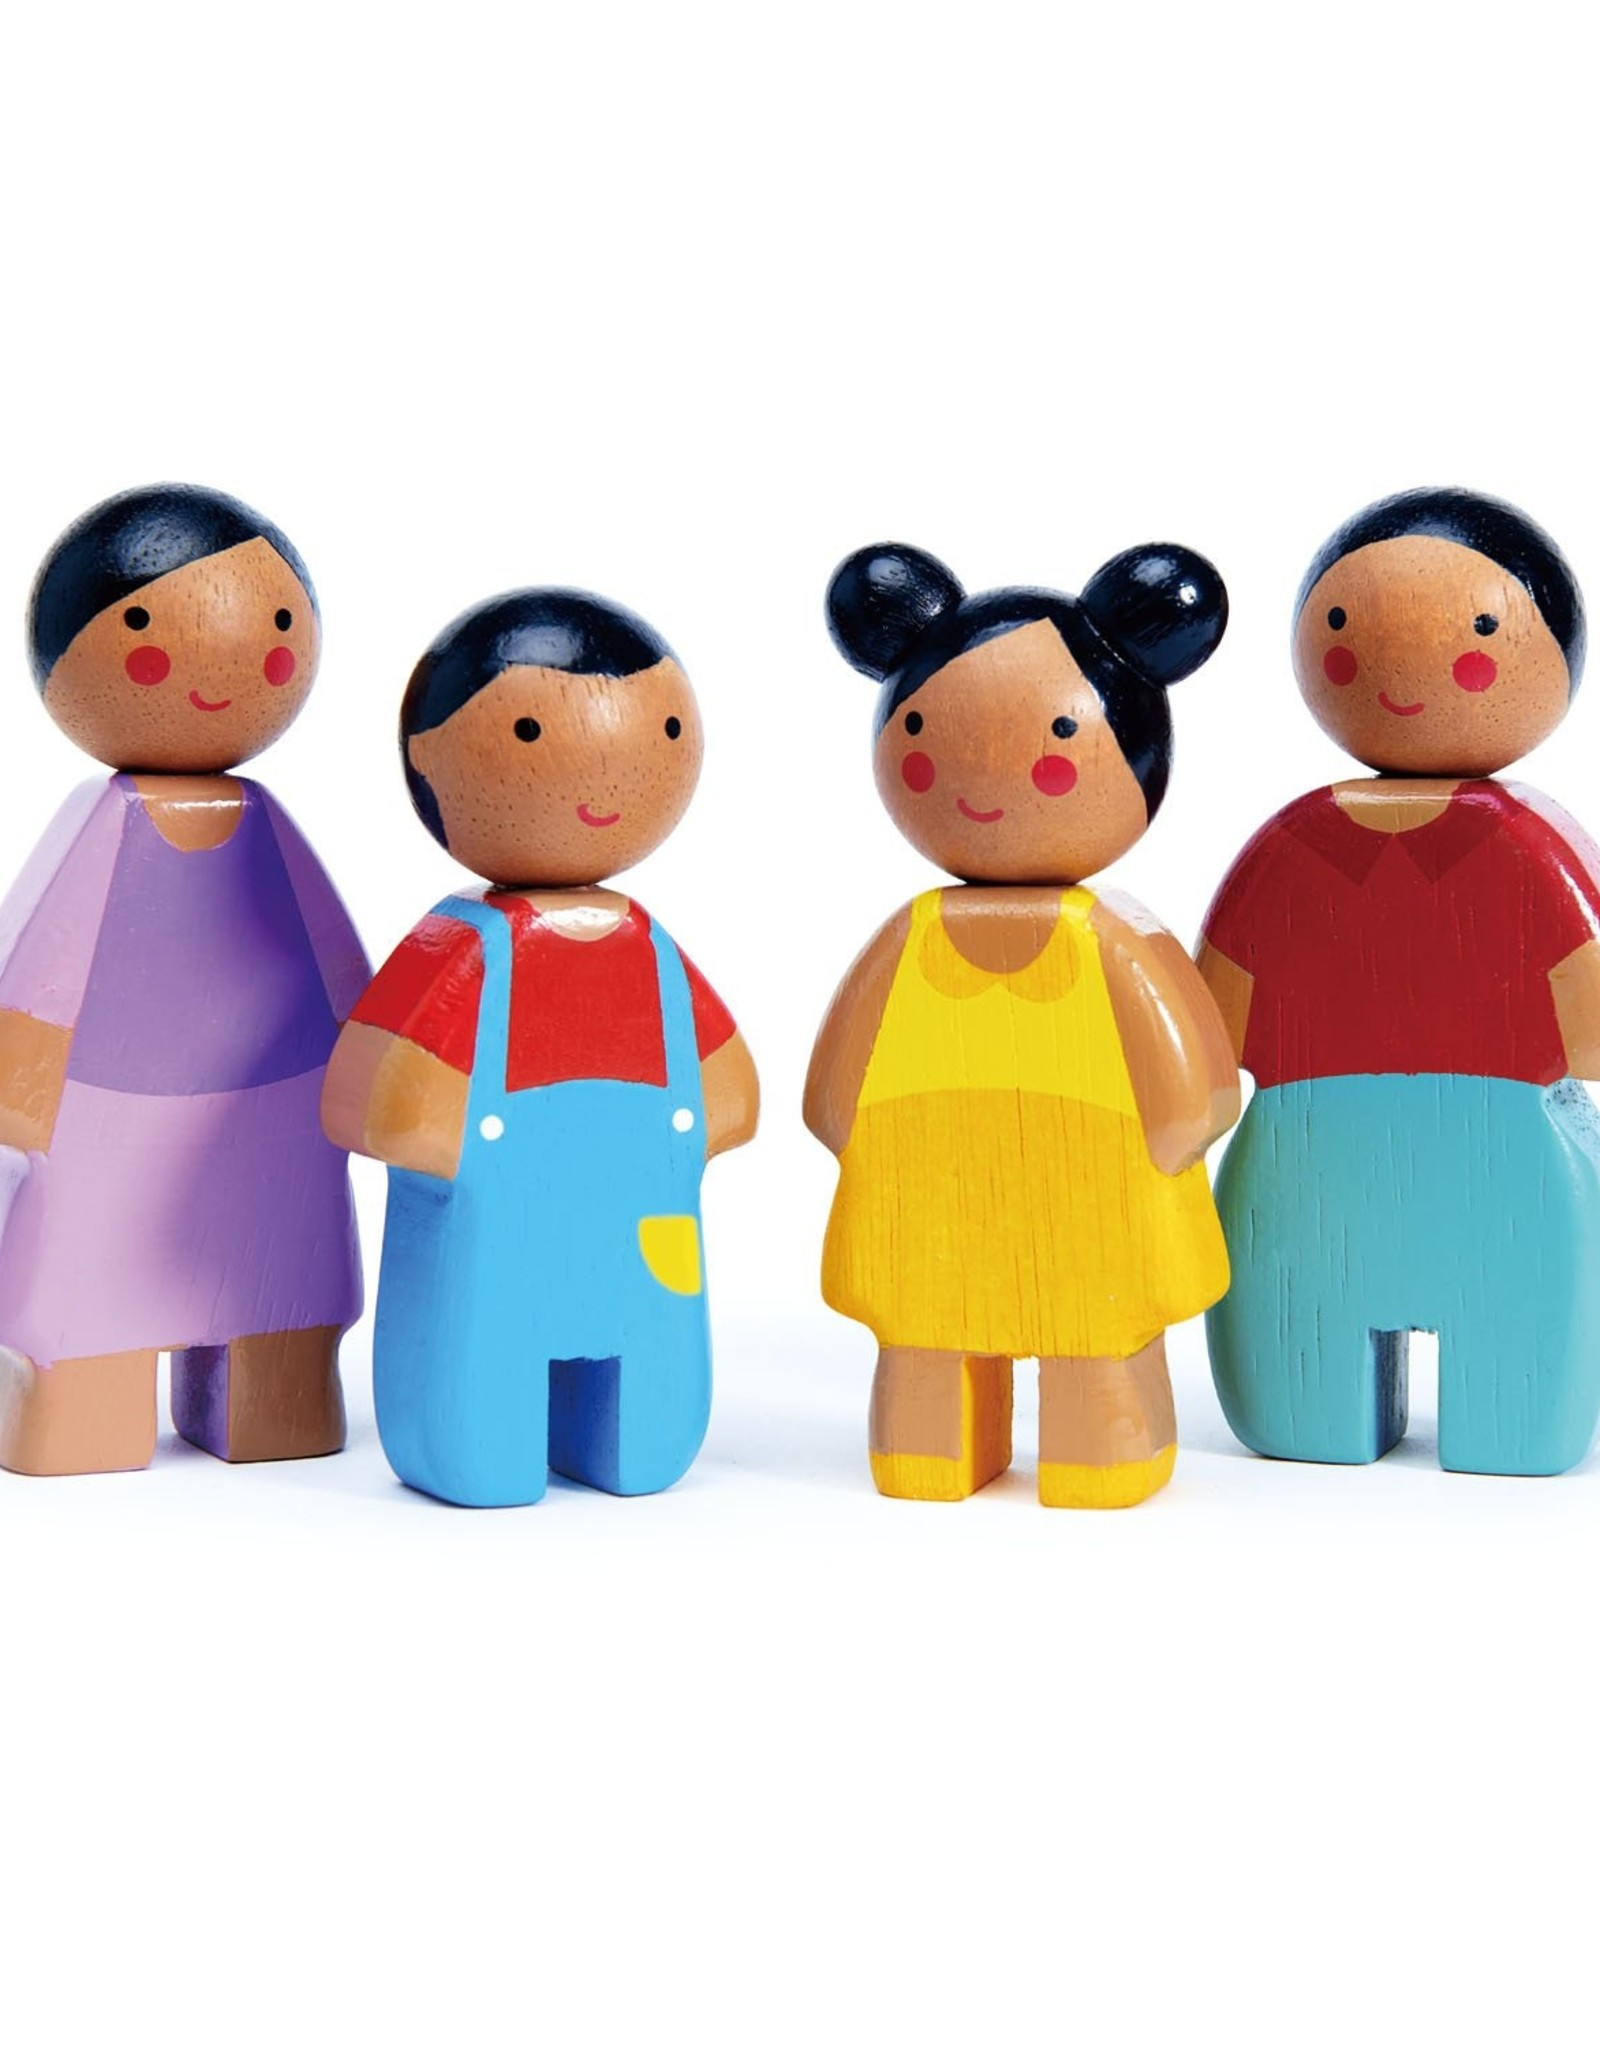 Tender leaf toys Figurines Famille Soleil